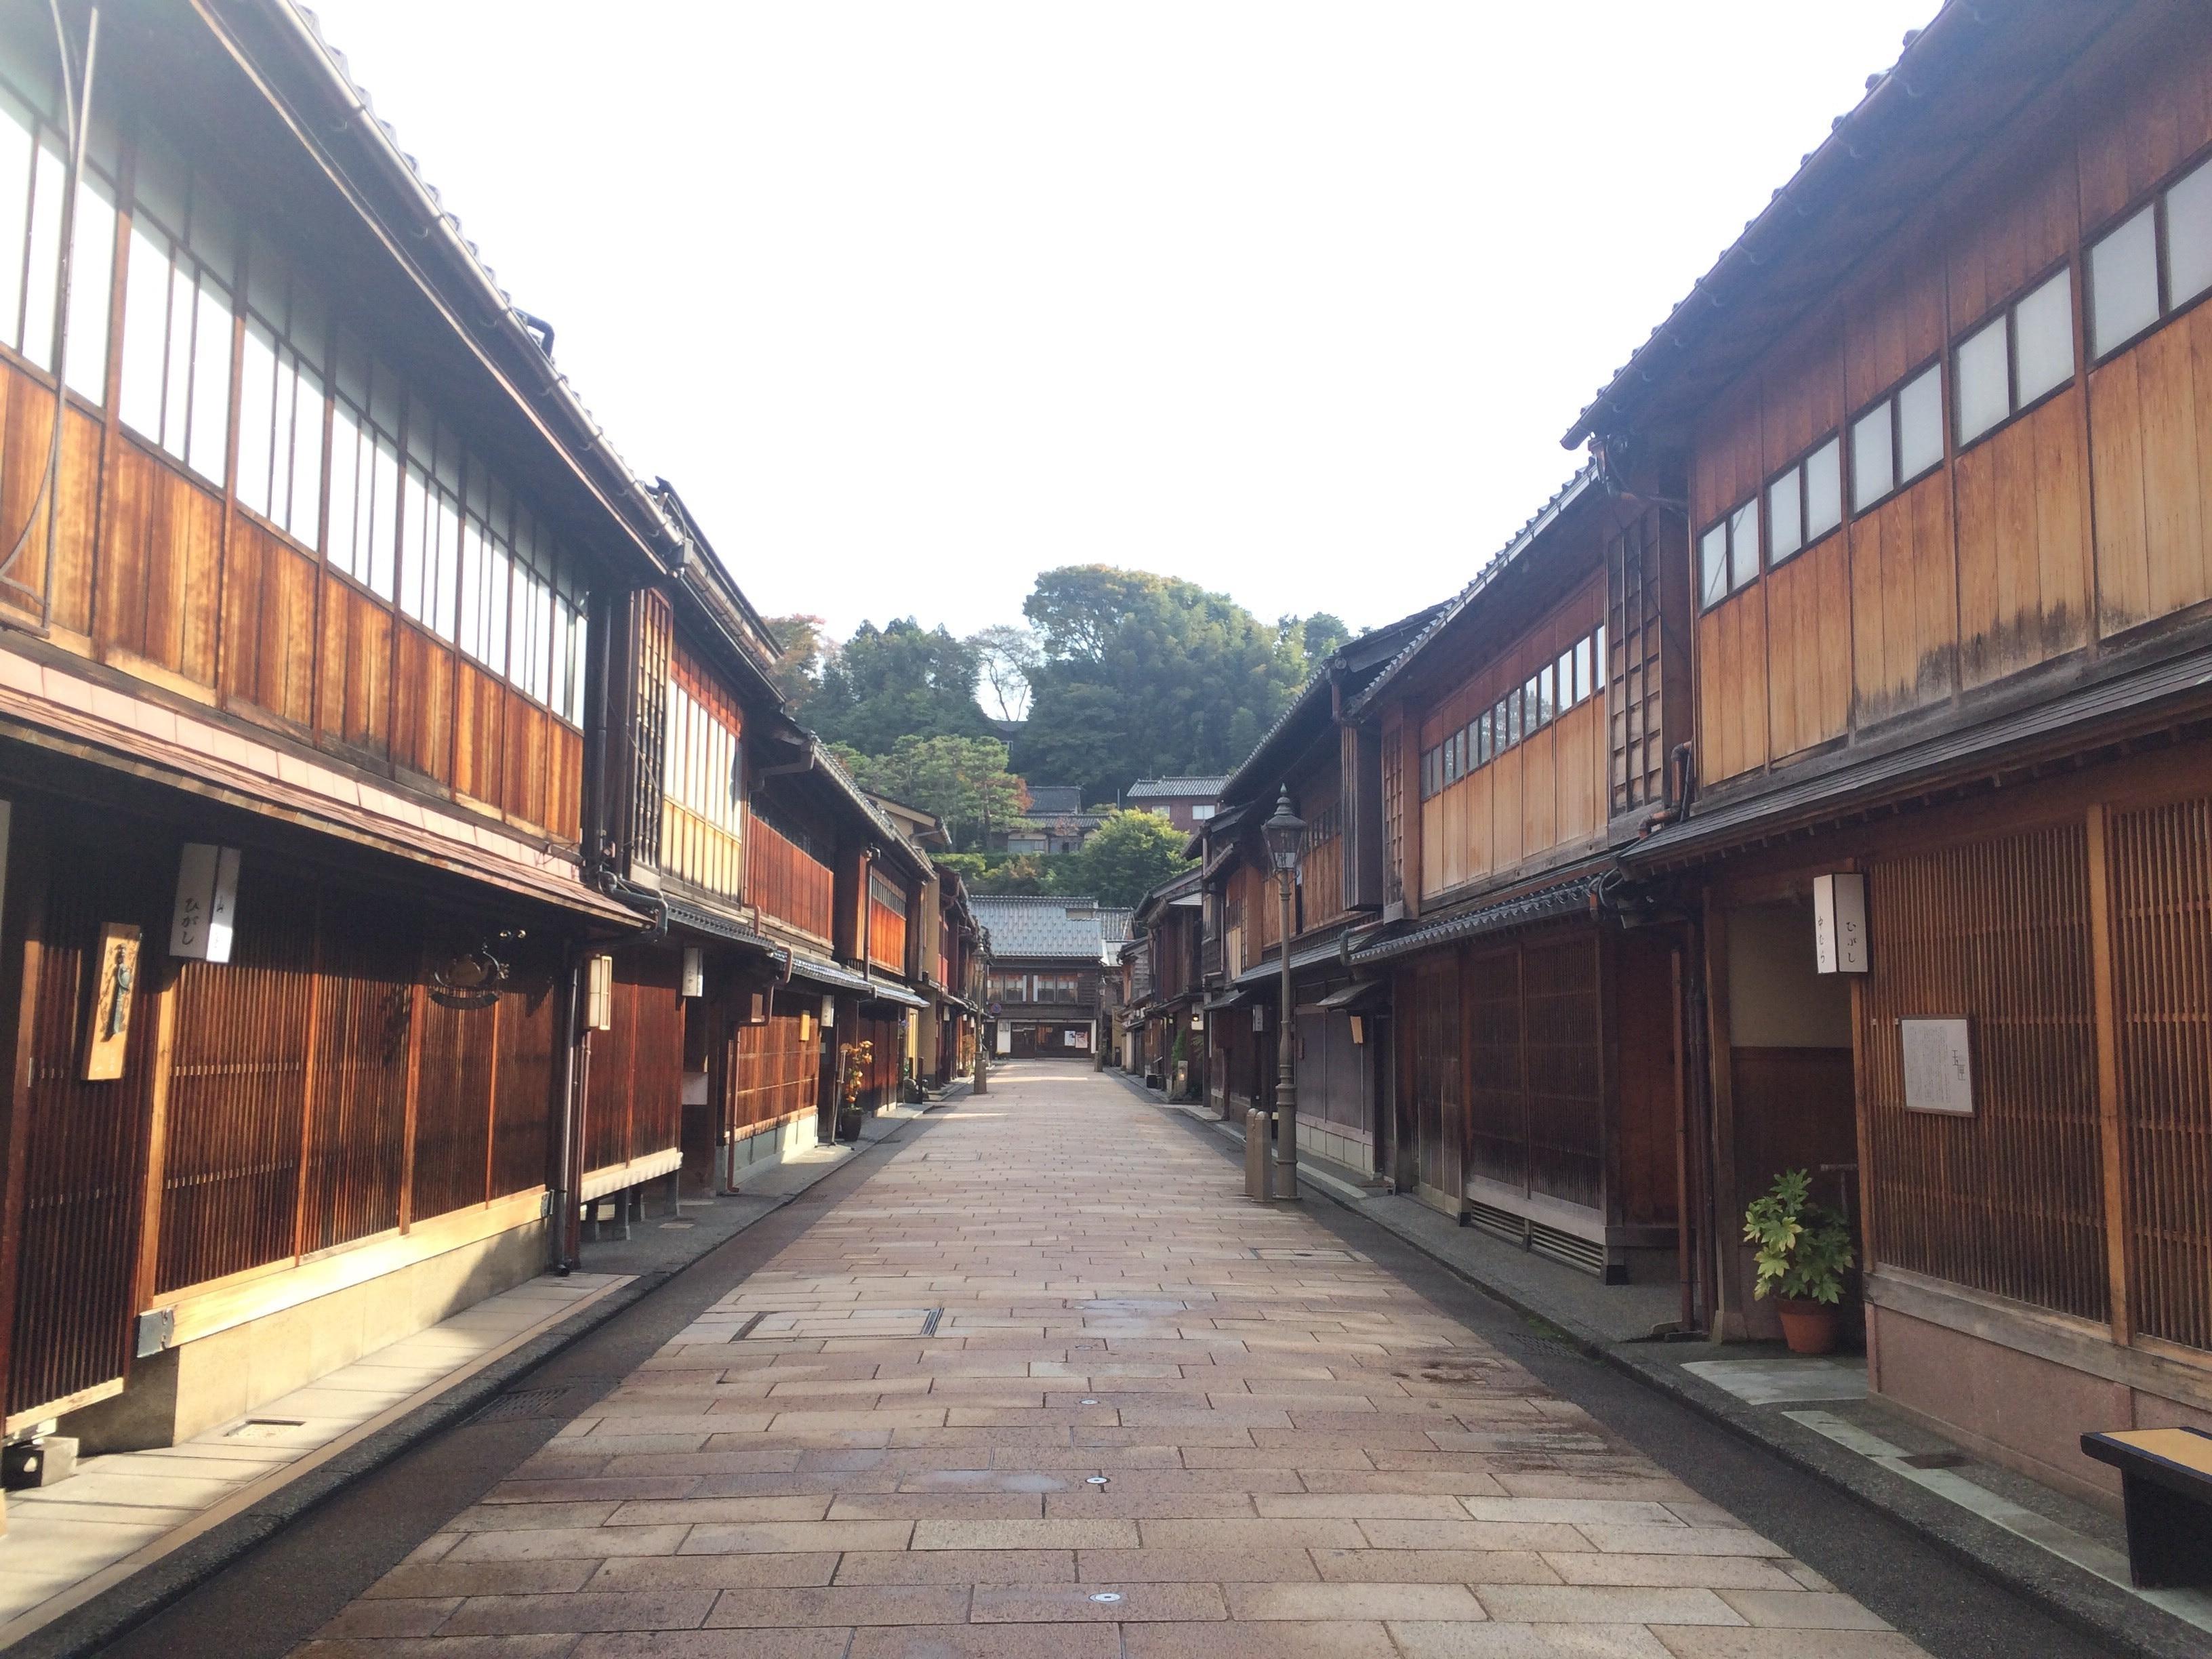 Higashi Chaya District, Kanazawa, Ishikawa (prefektur), Japan